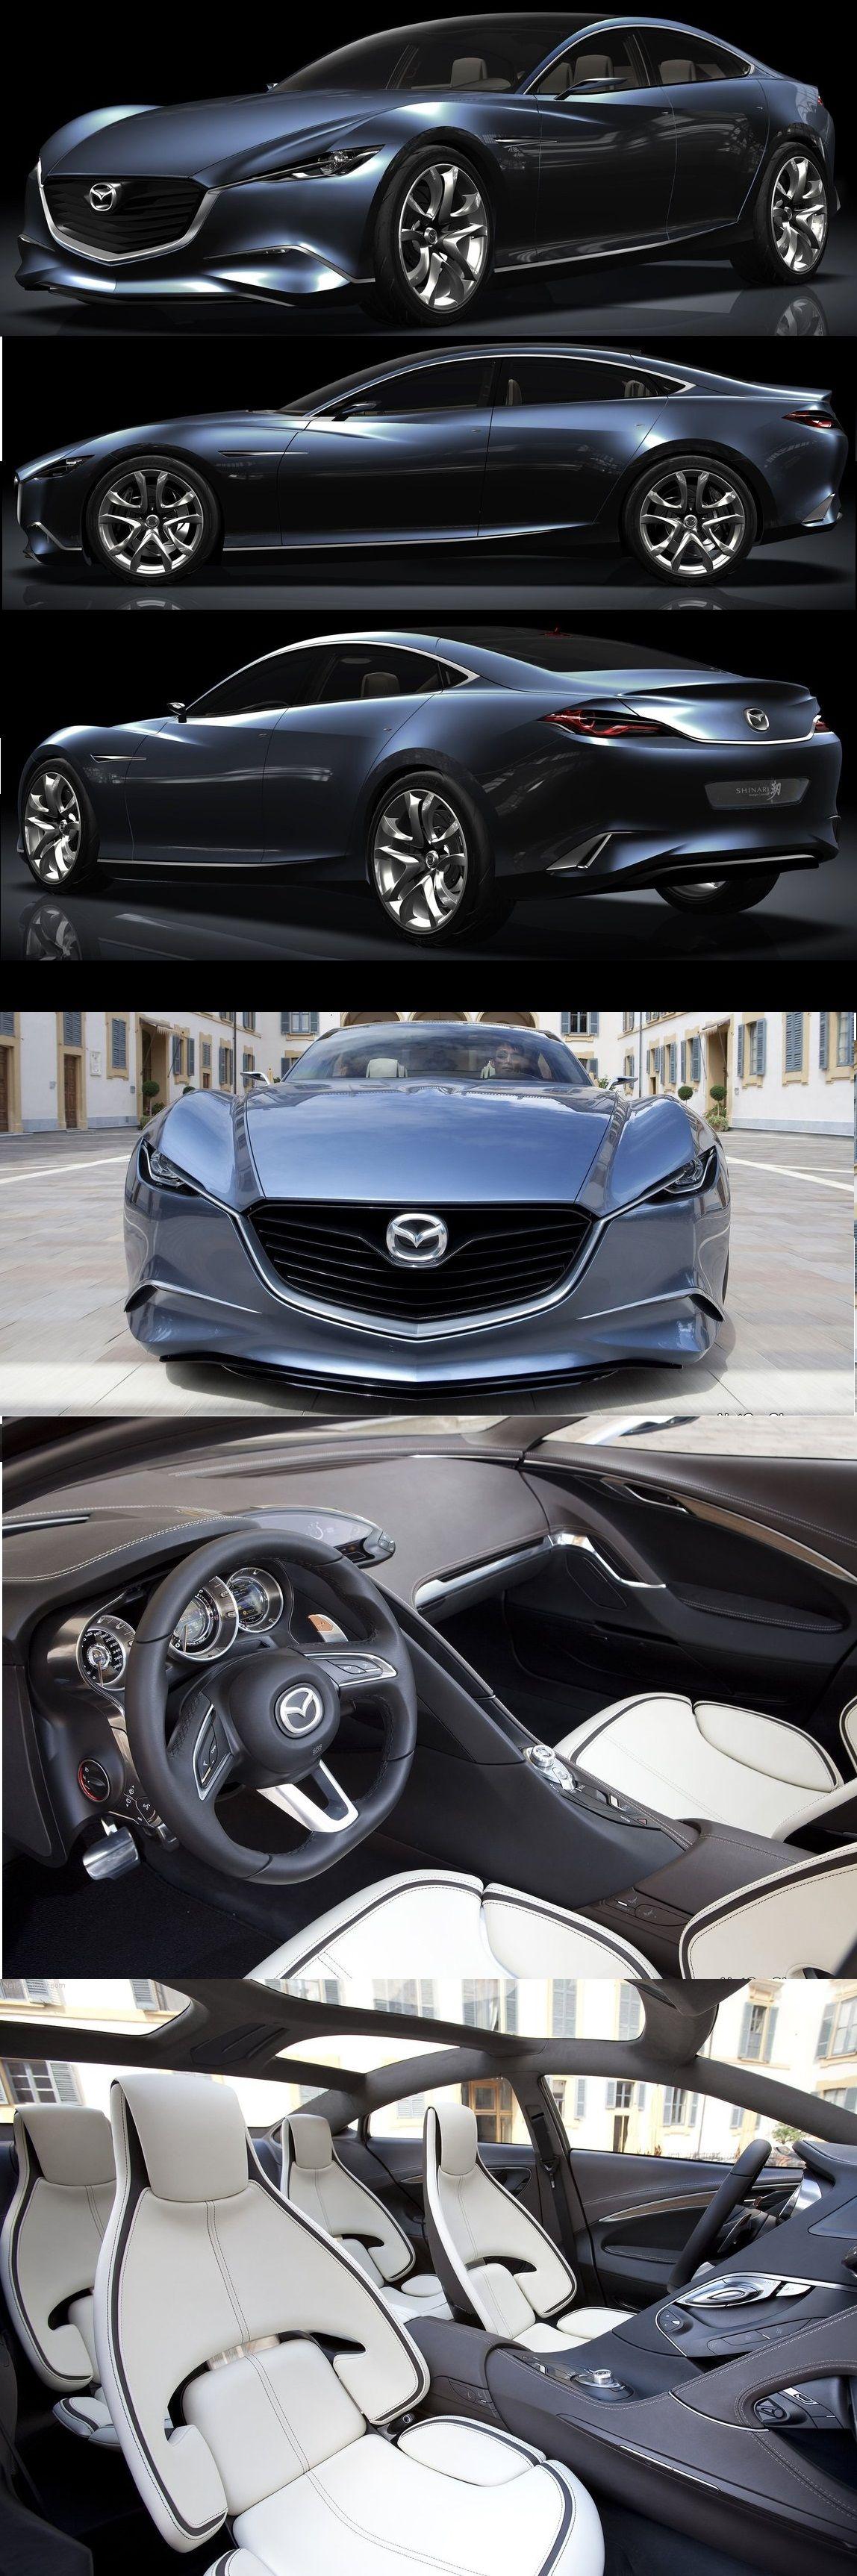 Mazda Shinari Concept (2010)   Mazda Classics & Concepts   Pinterest ...